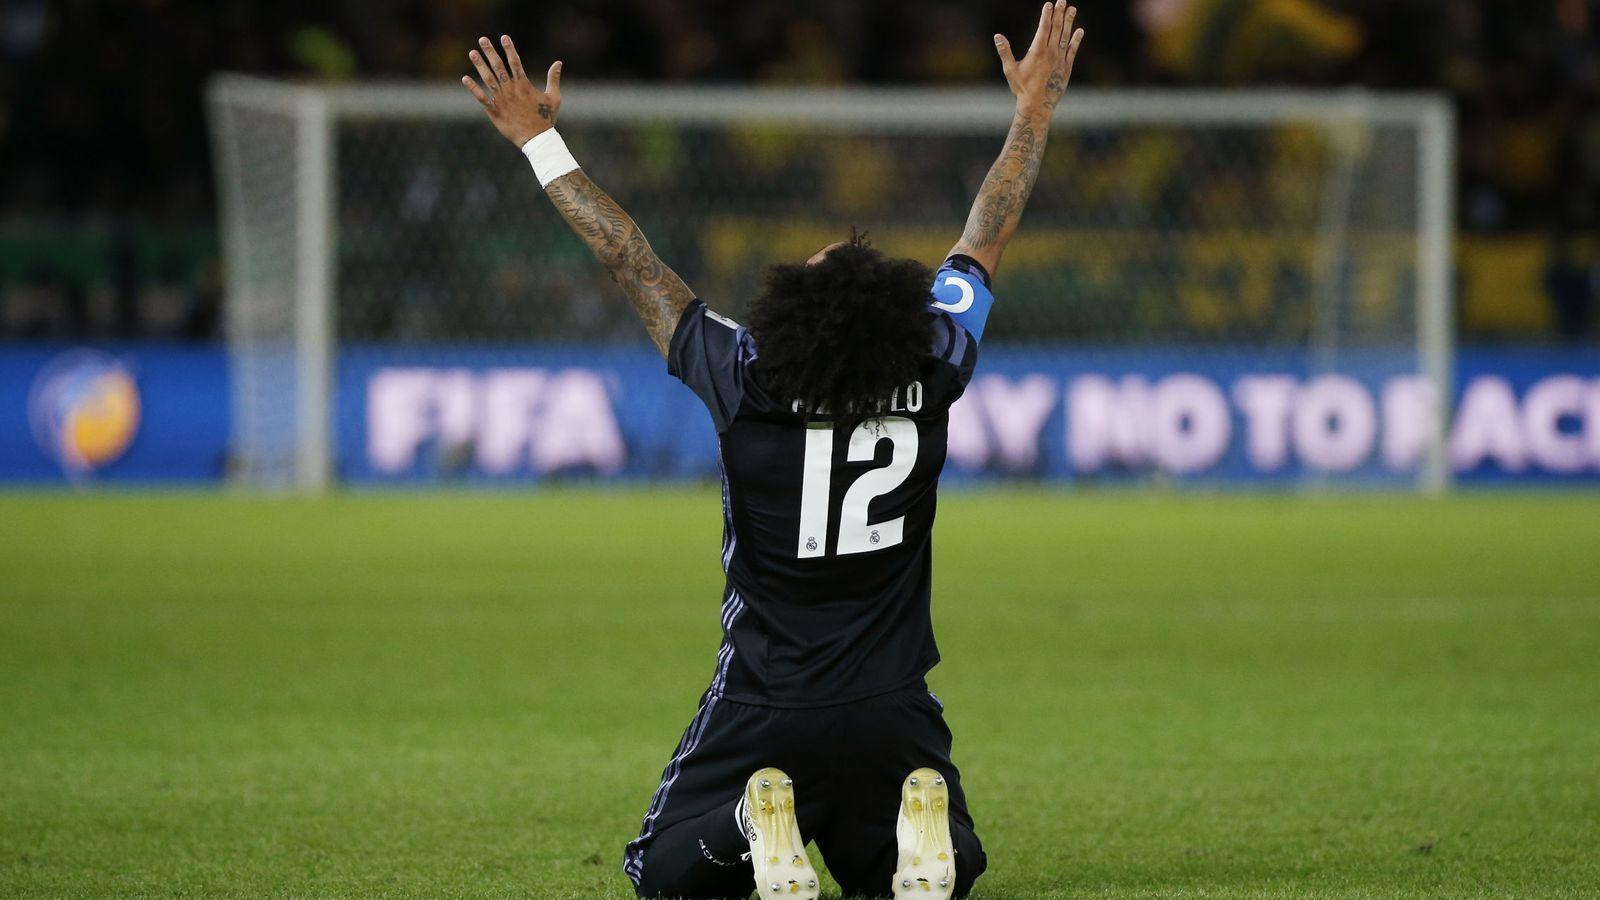 Foto: Marcelo celebra uno de los goles al América (Issei Kato/Reuters).